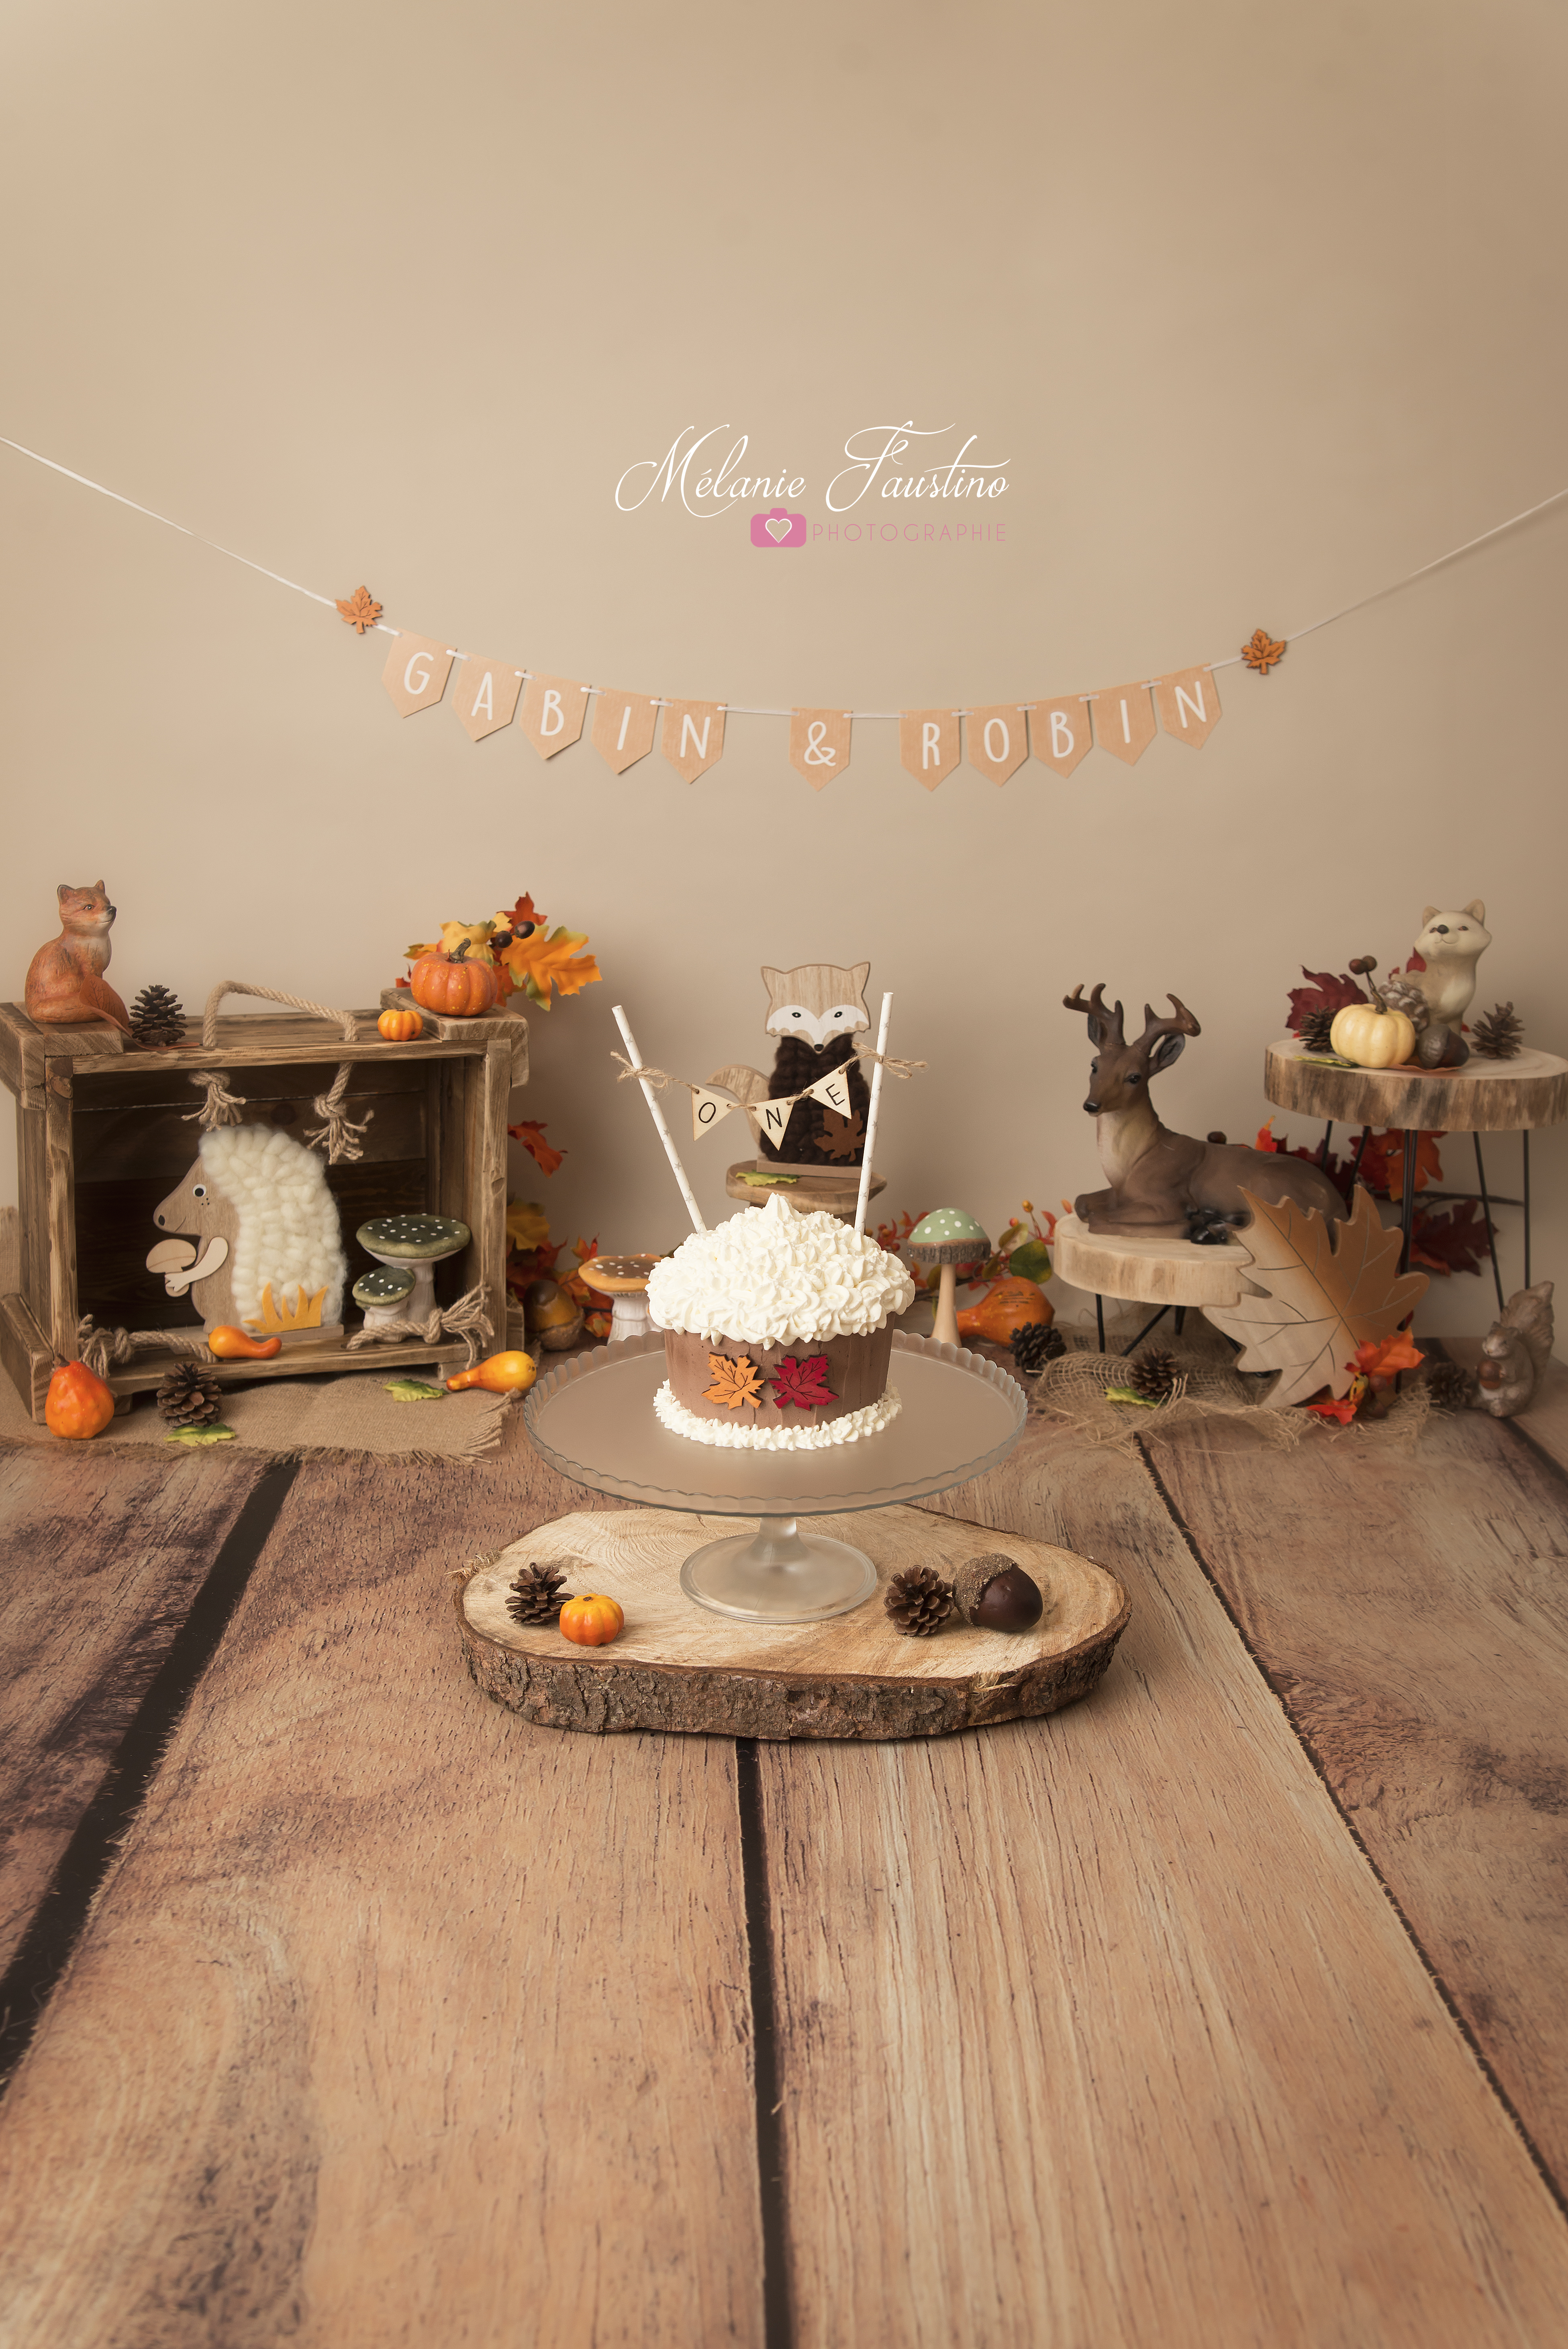 décor smash the cake studio photo 94